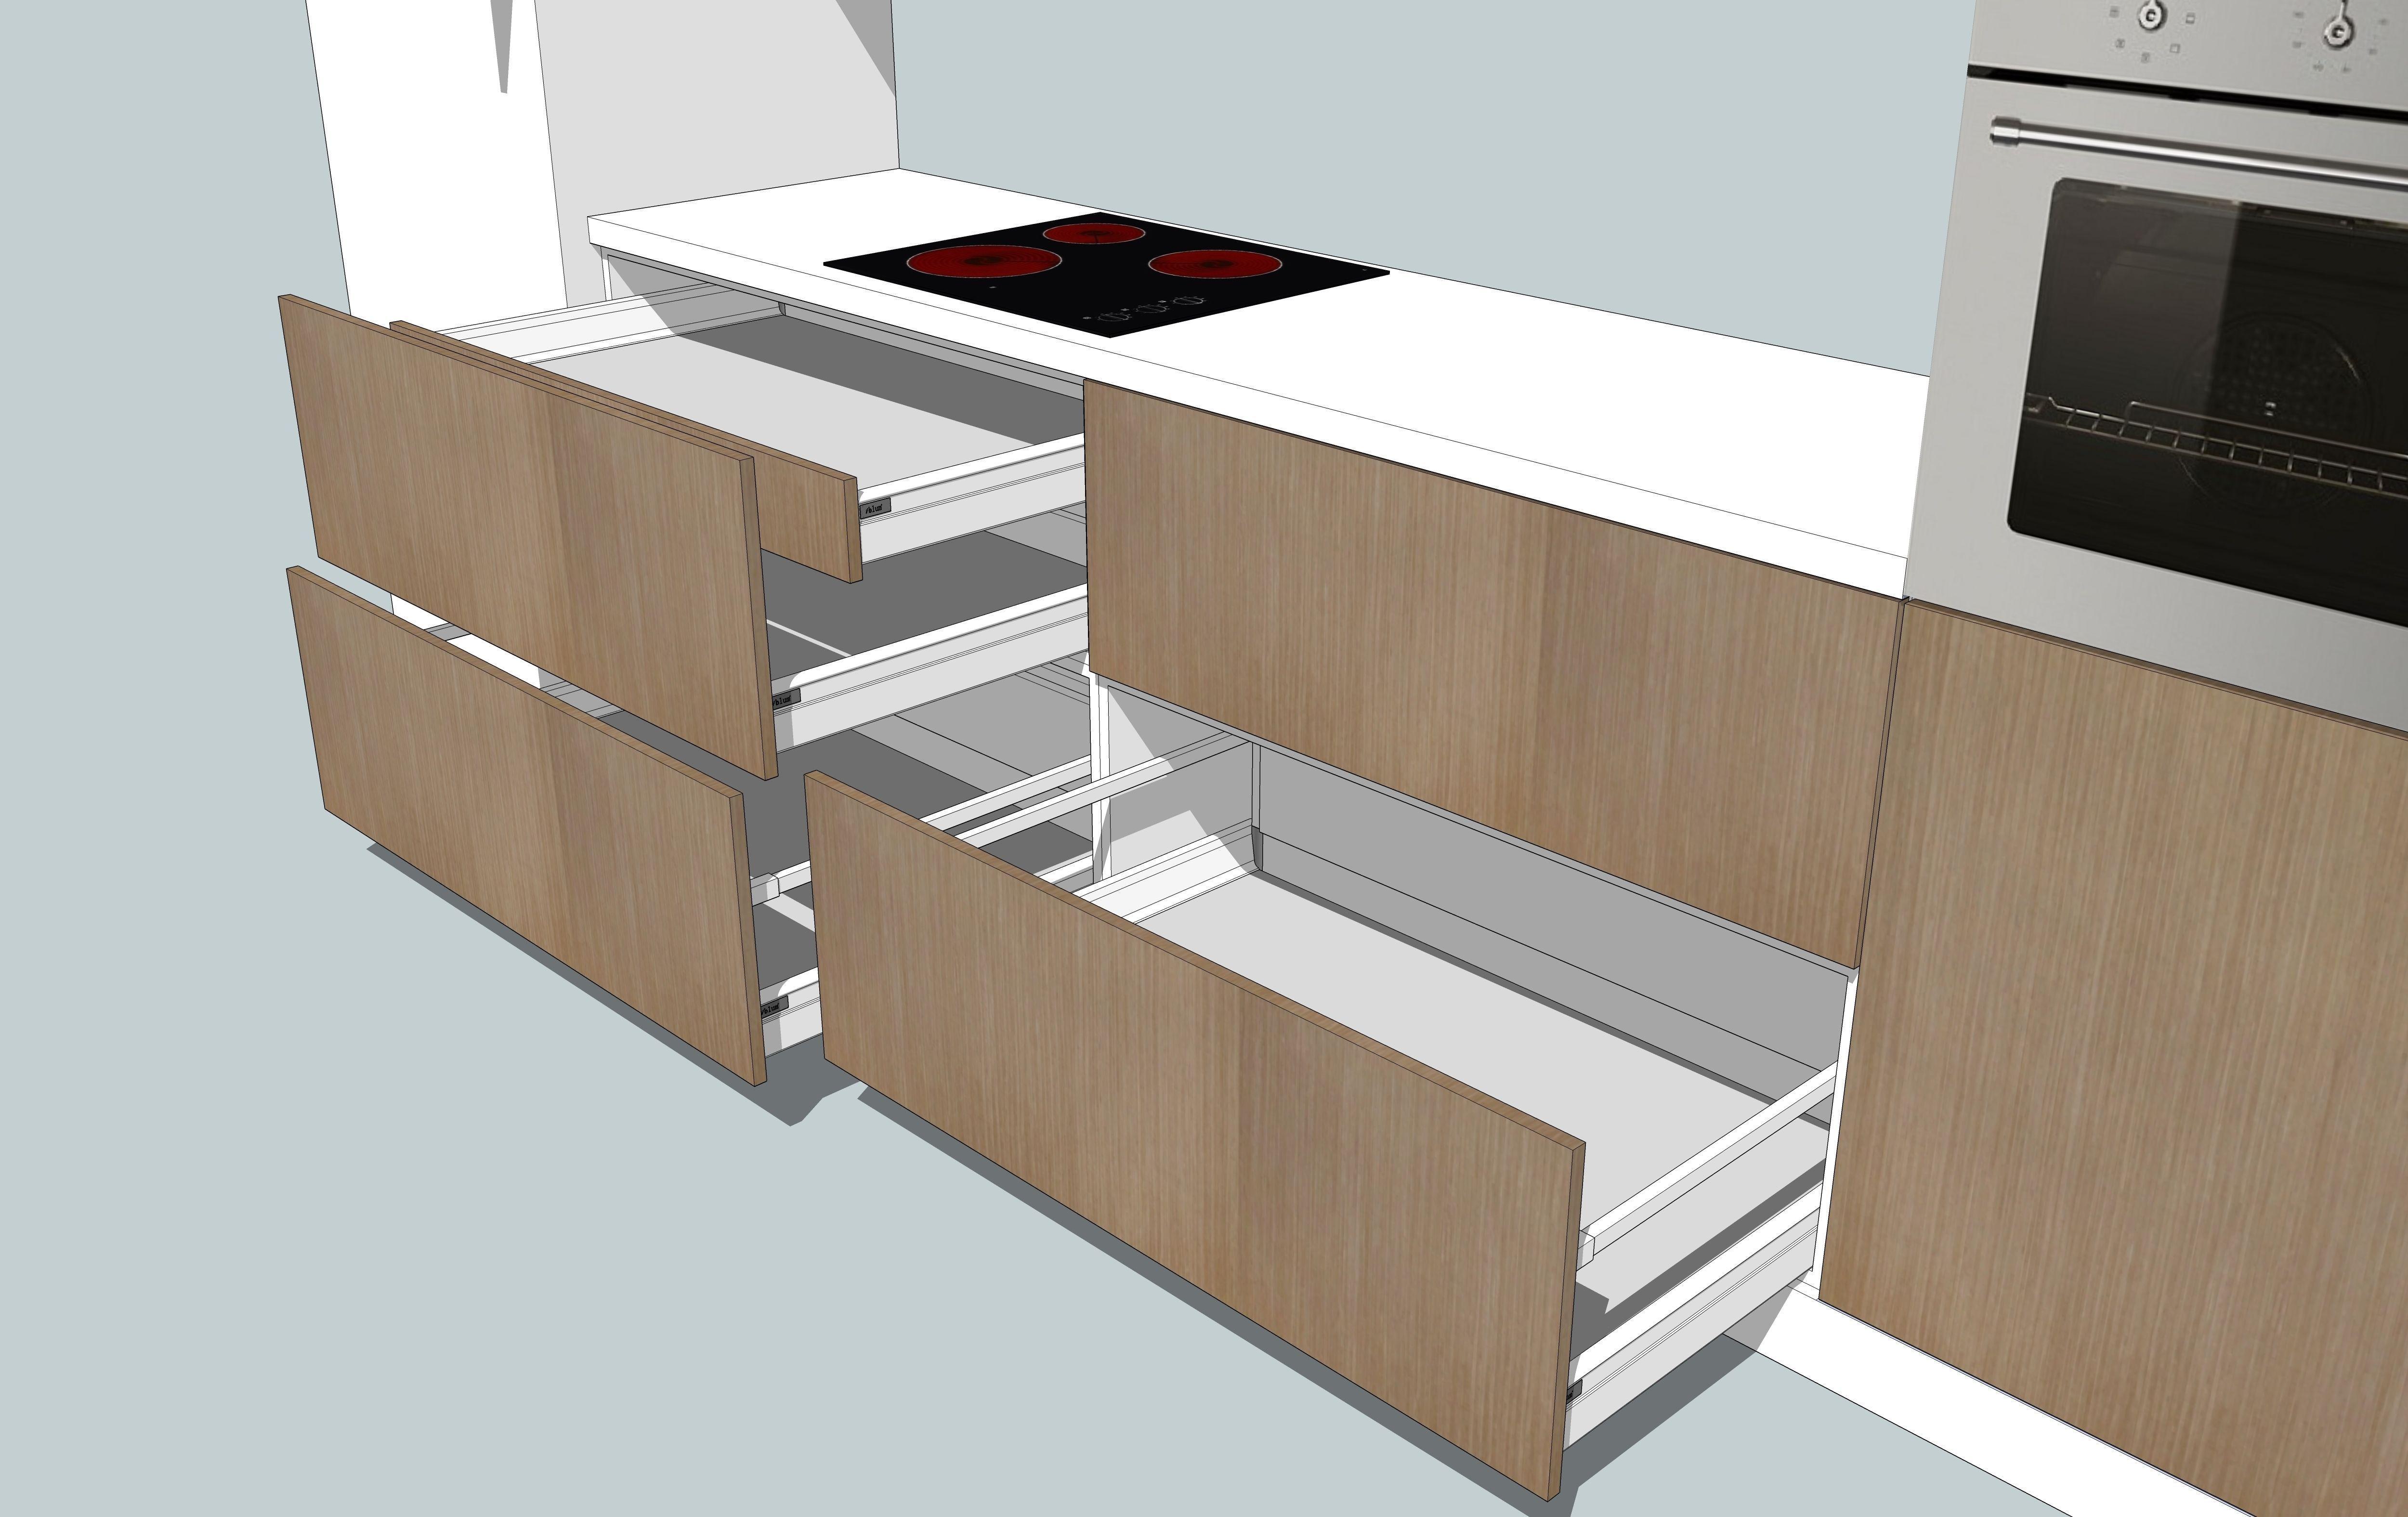 Kitchen 3d Model kitchen 3d model architectural | cgtrader